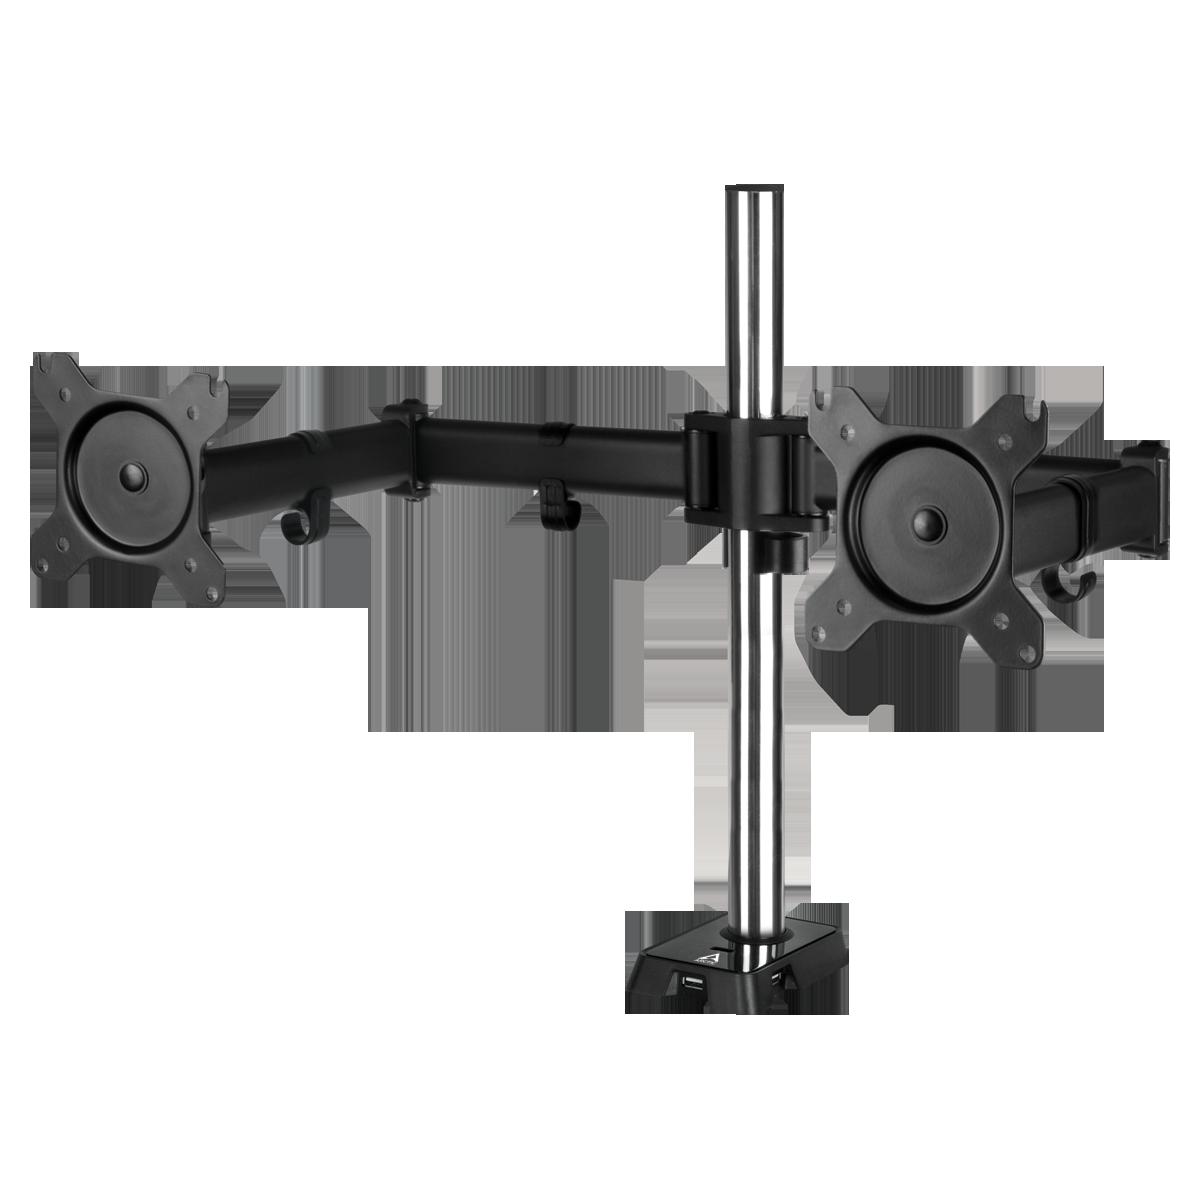 Desk Mount Dual Monitor Arm with USB Hub ARCTIC Z2 (Gen 3)